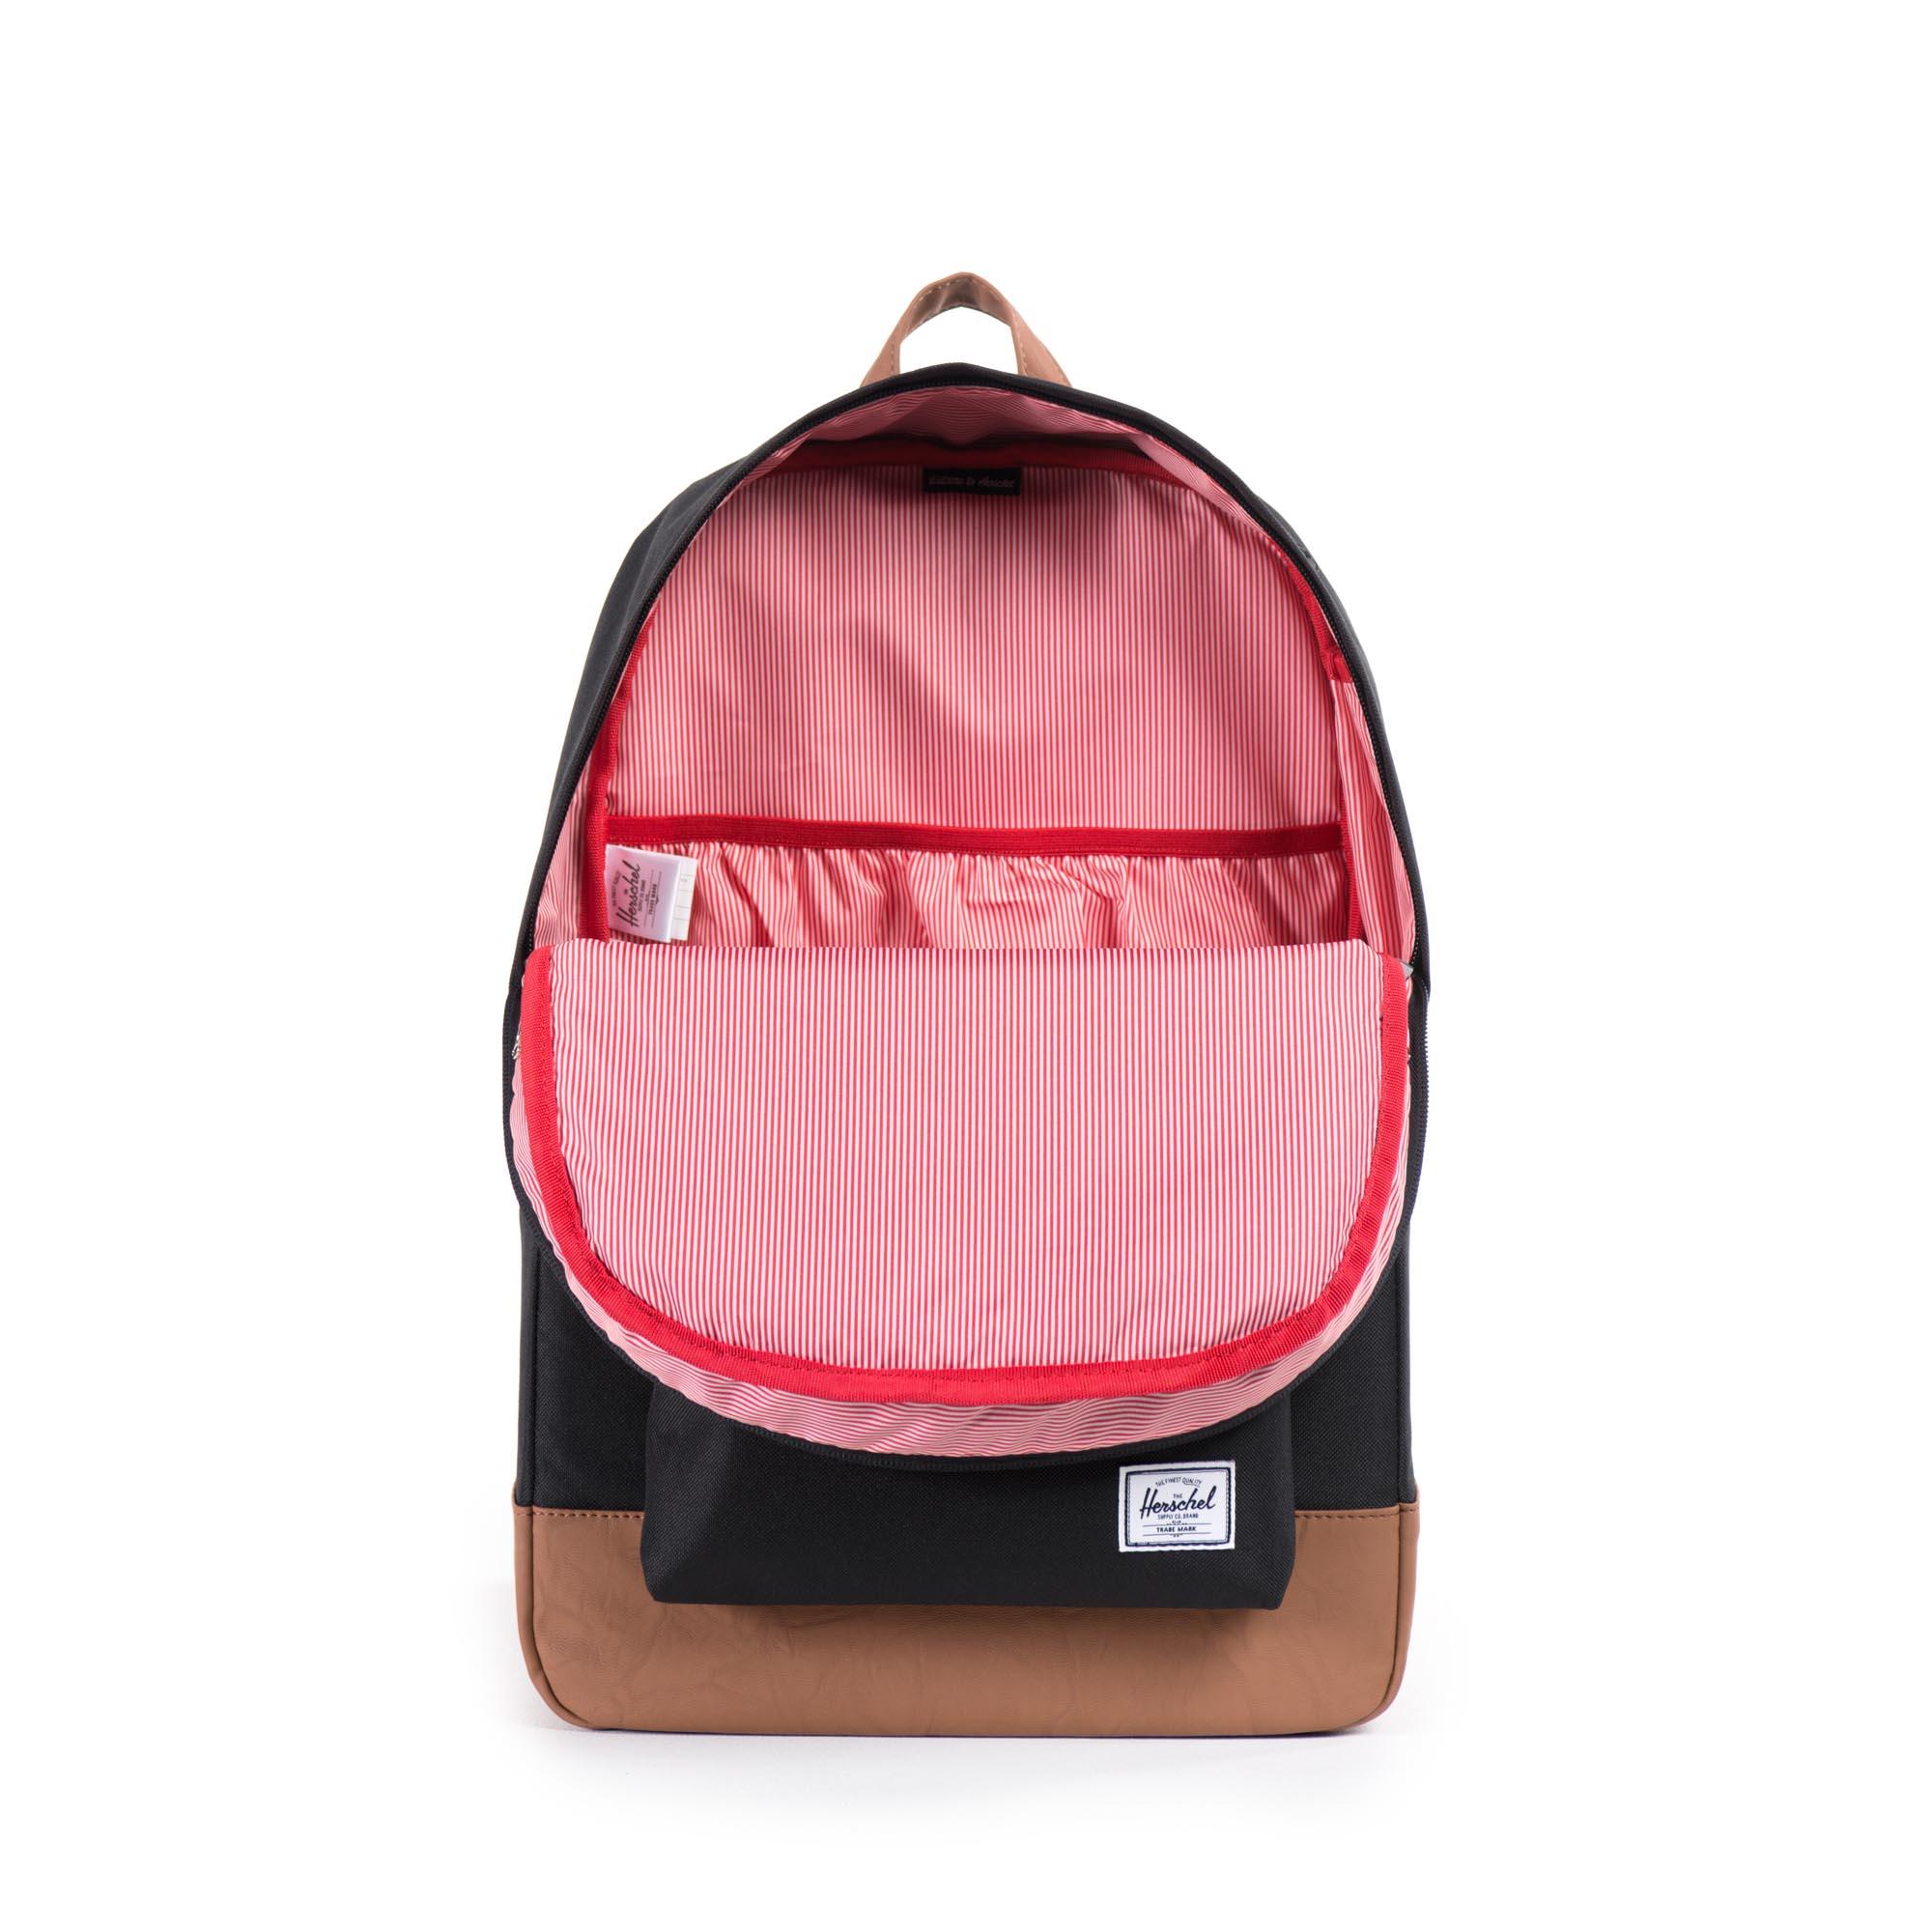 Herschel Rucksack Heritage Backpack Black/Tan Synthetic Leather 10007-00055 F18-HT1